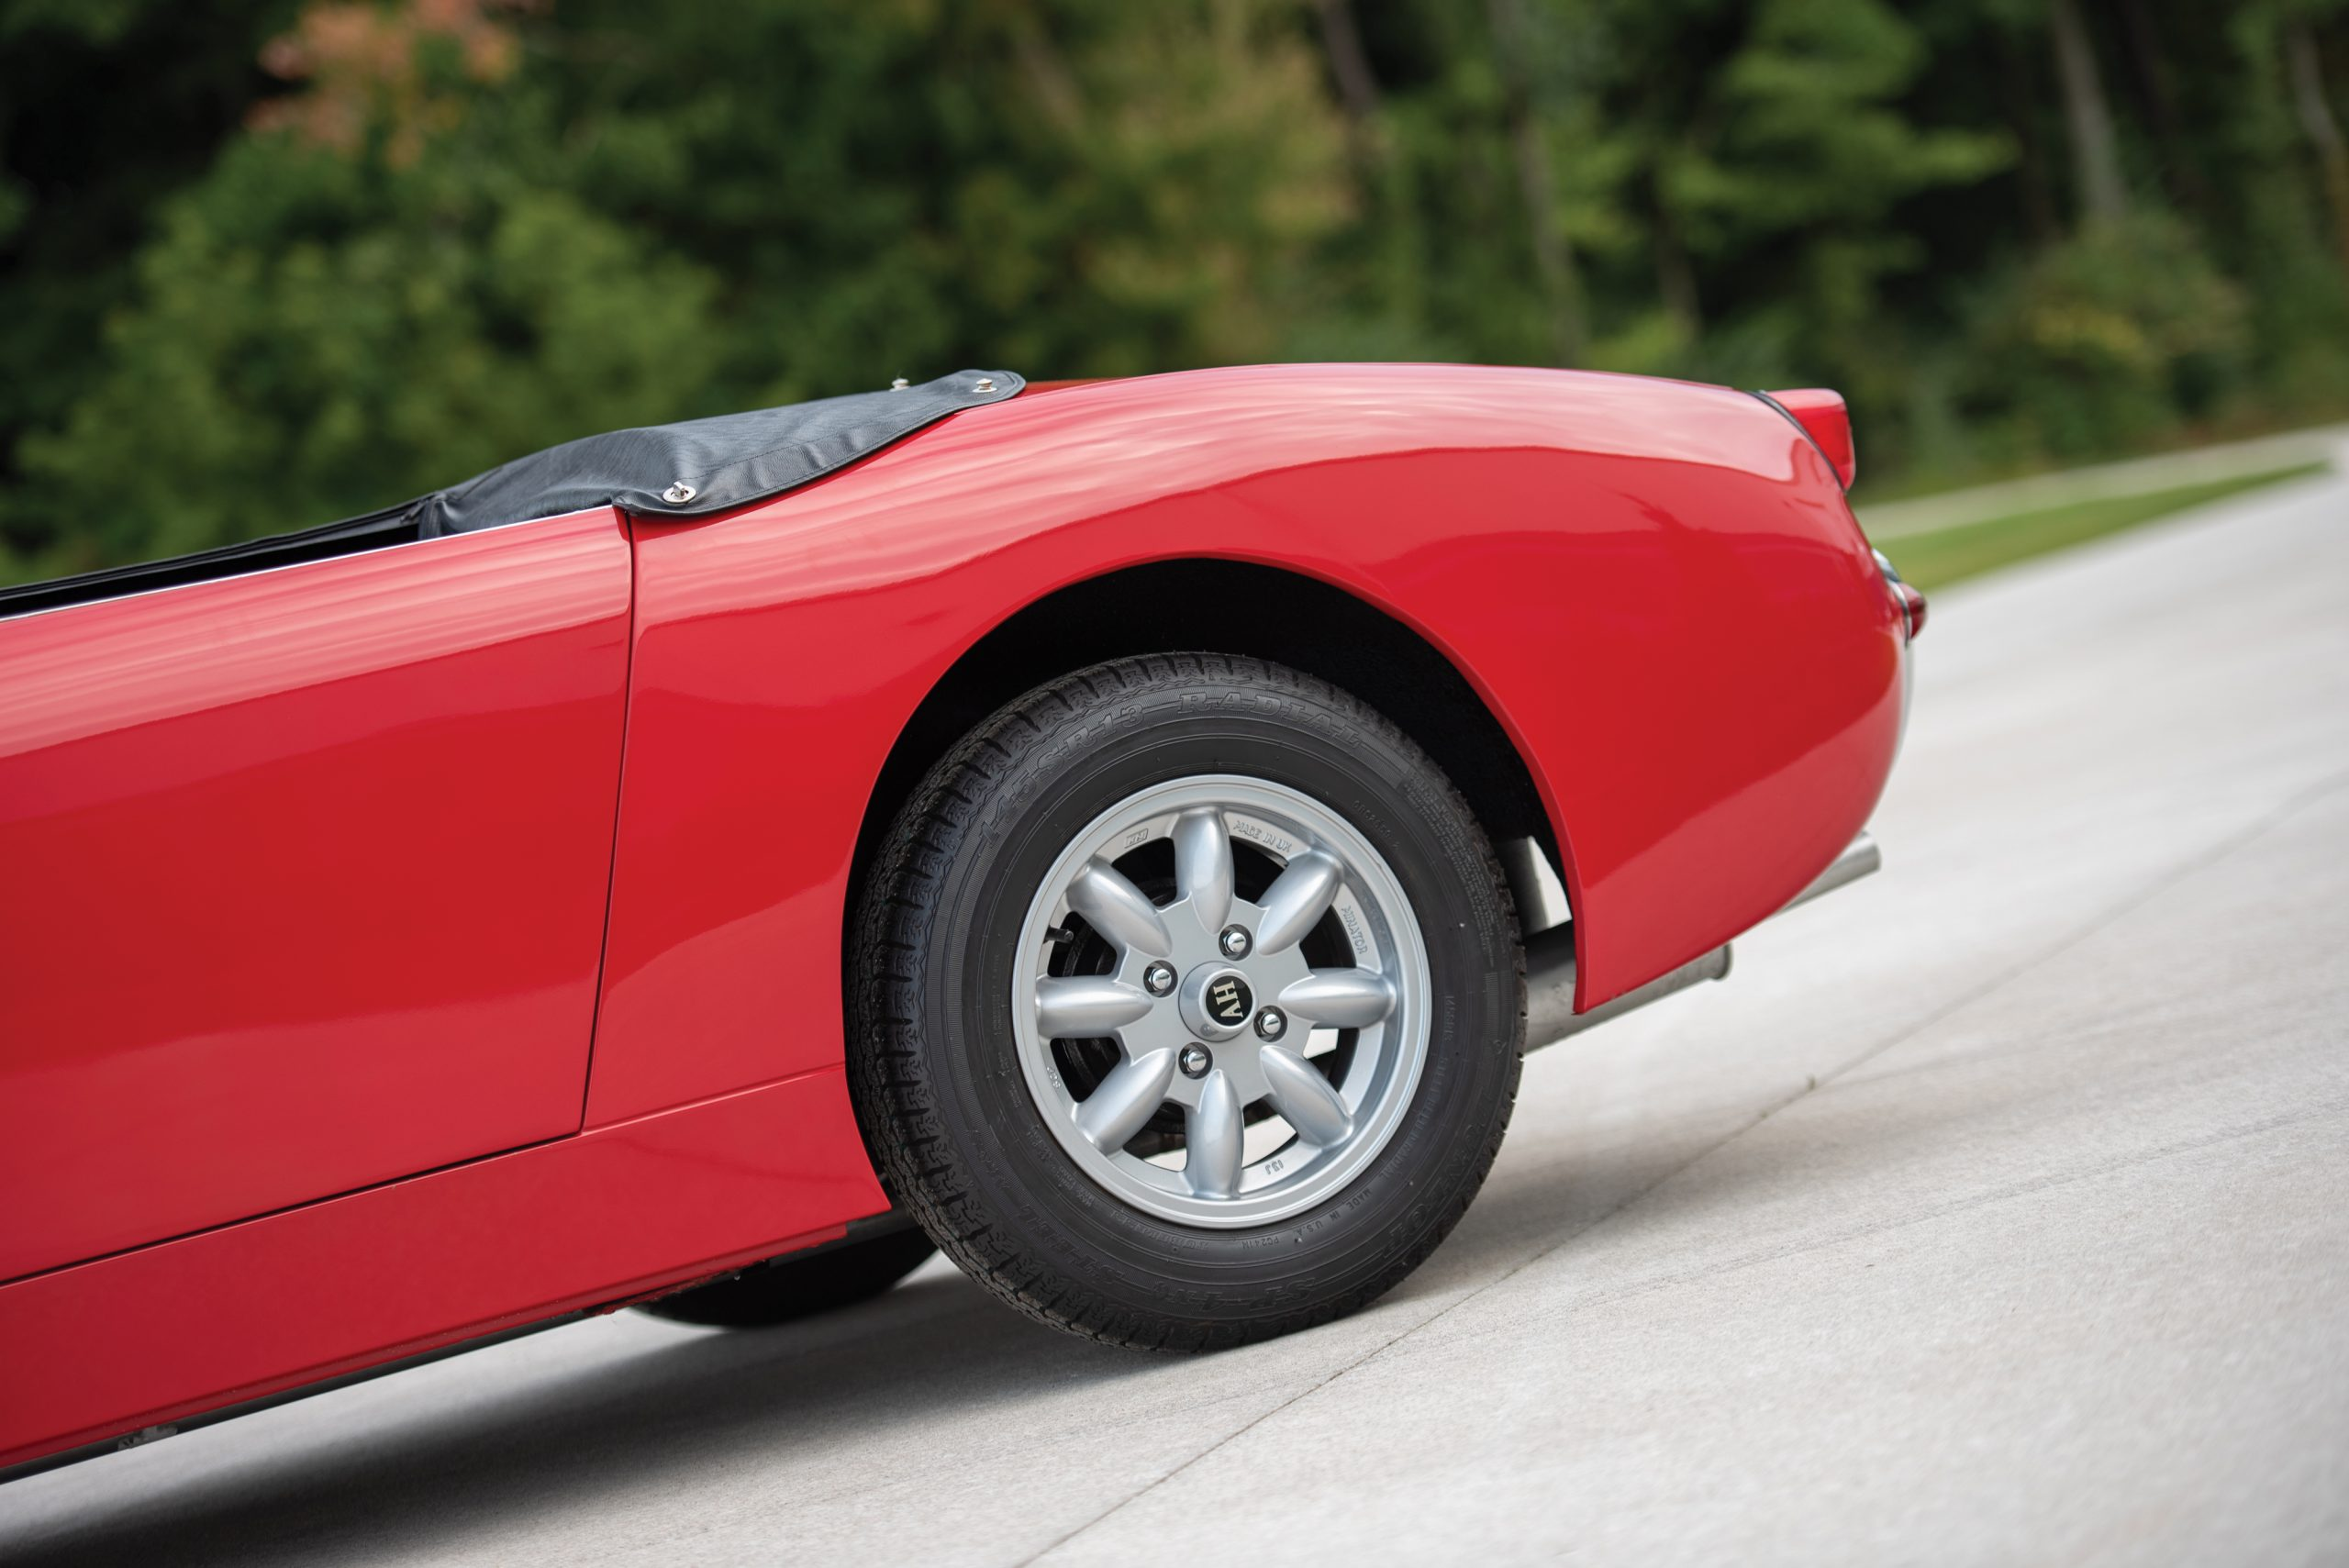 1959 Austin Healey Sprite Bugeye rear end